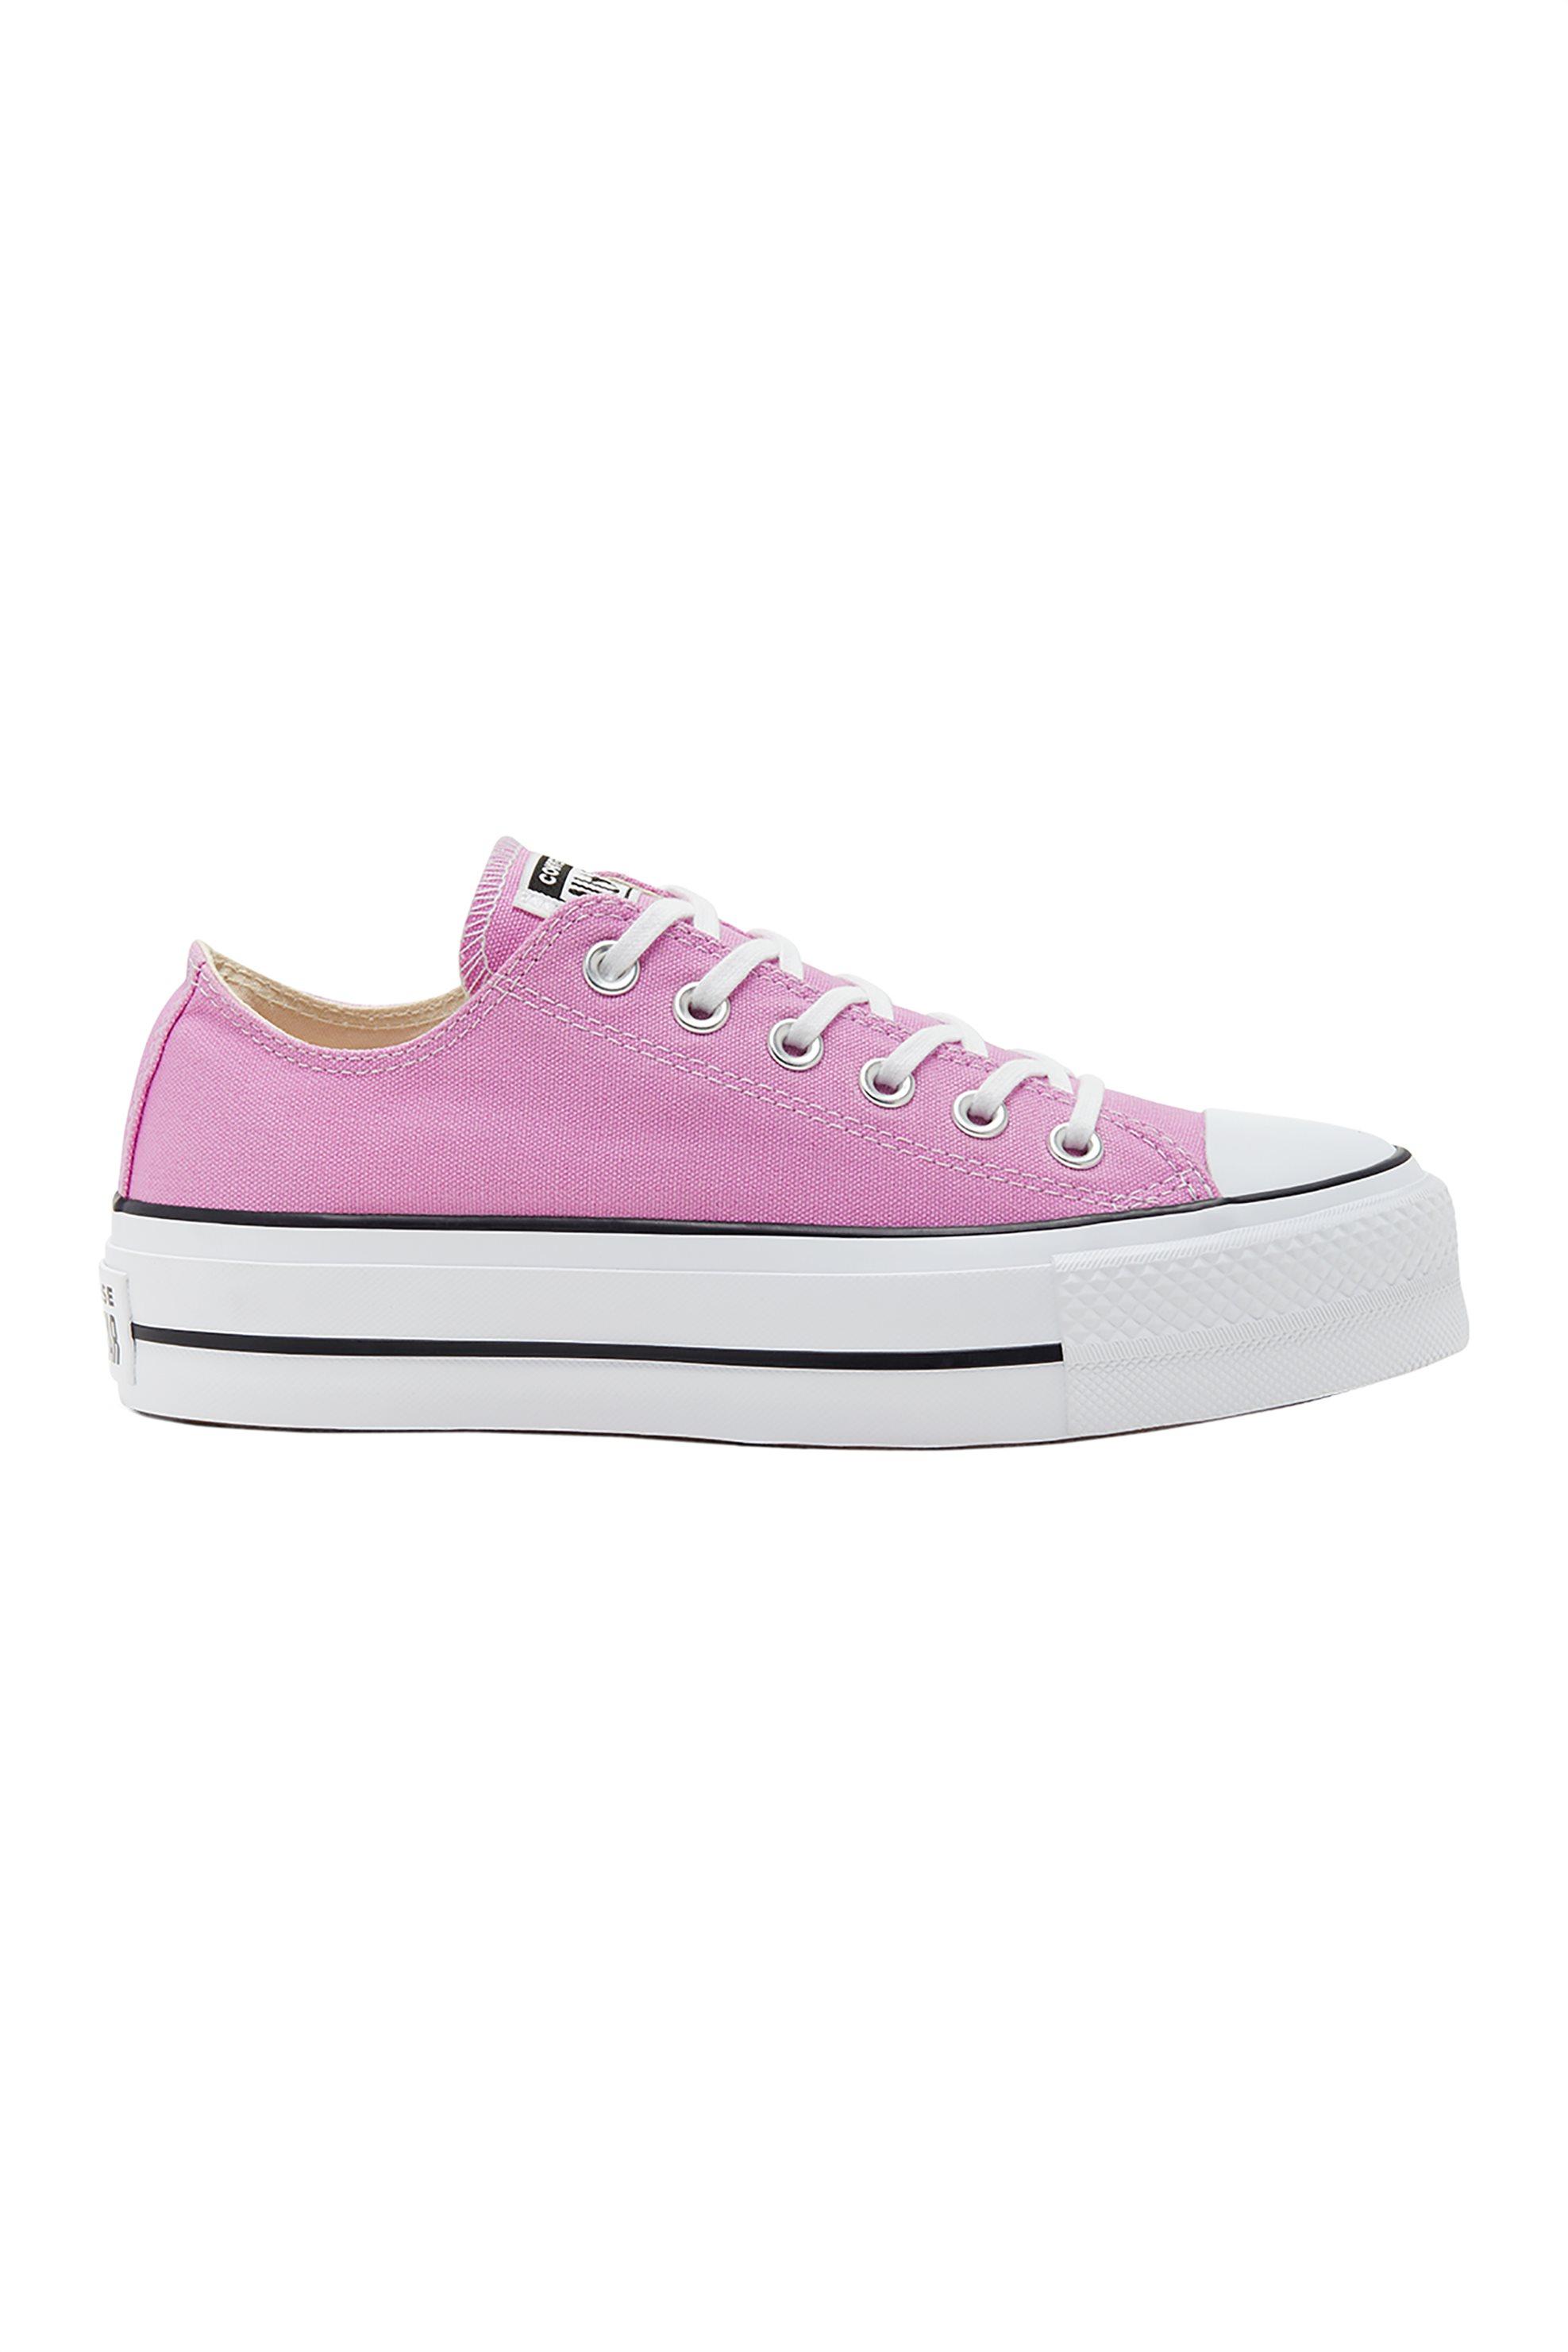 "Converse γυναικεία sneakers ""Platform Chuck Taylor All Star Low Top"" – 566756C – Ροζ"